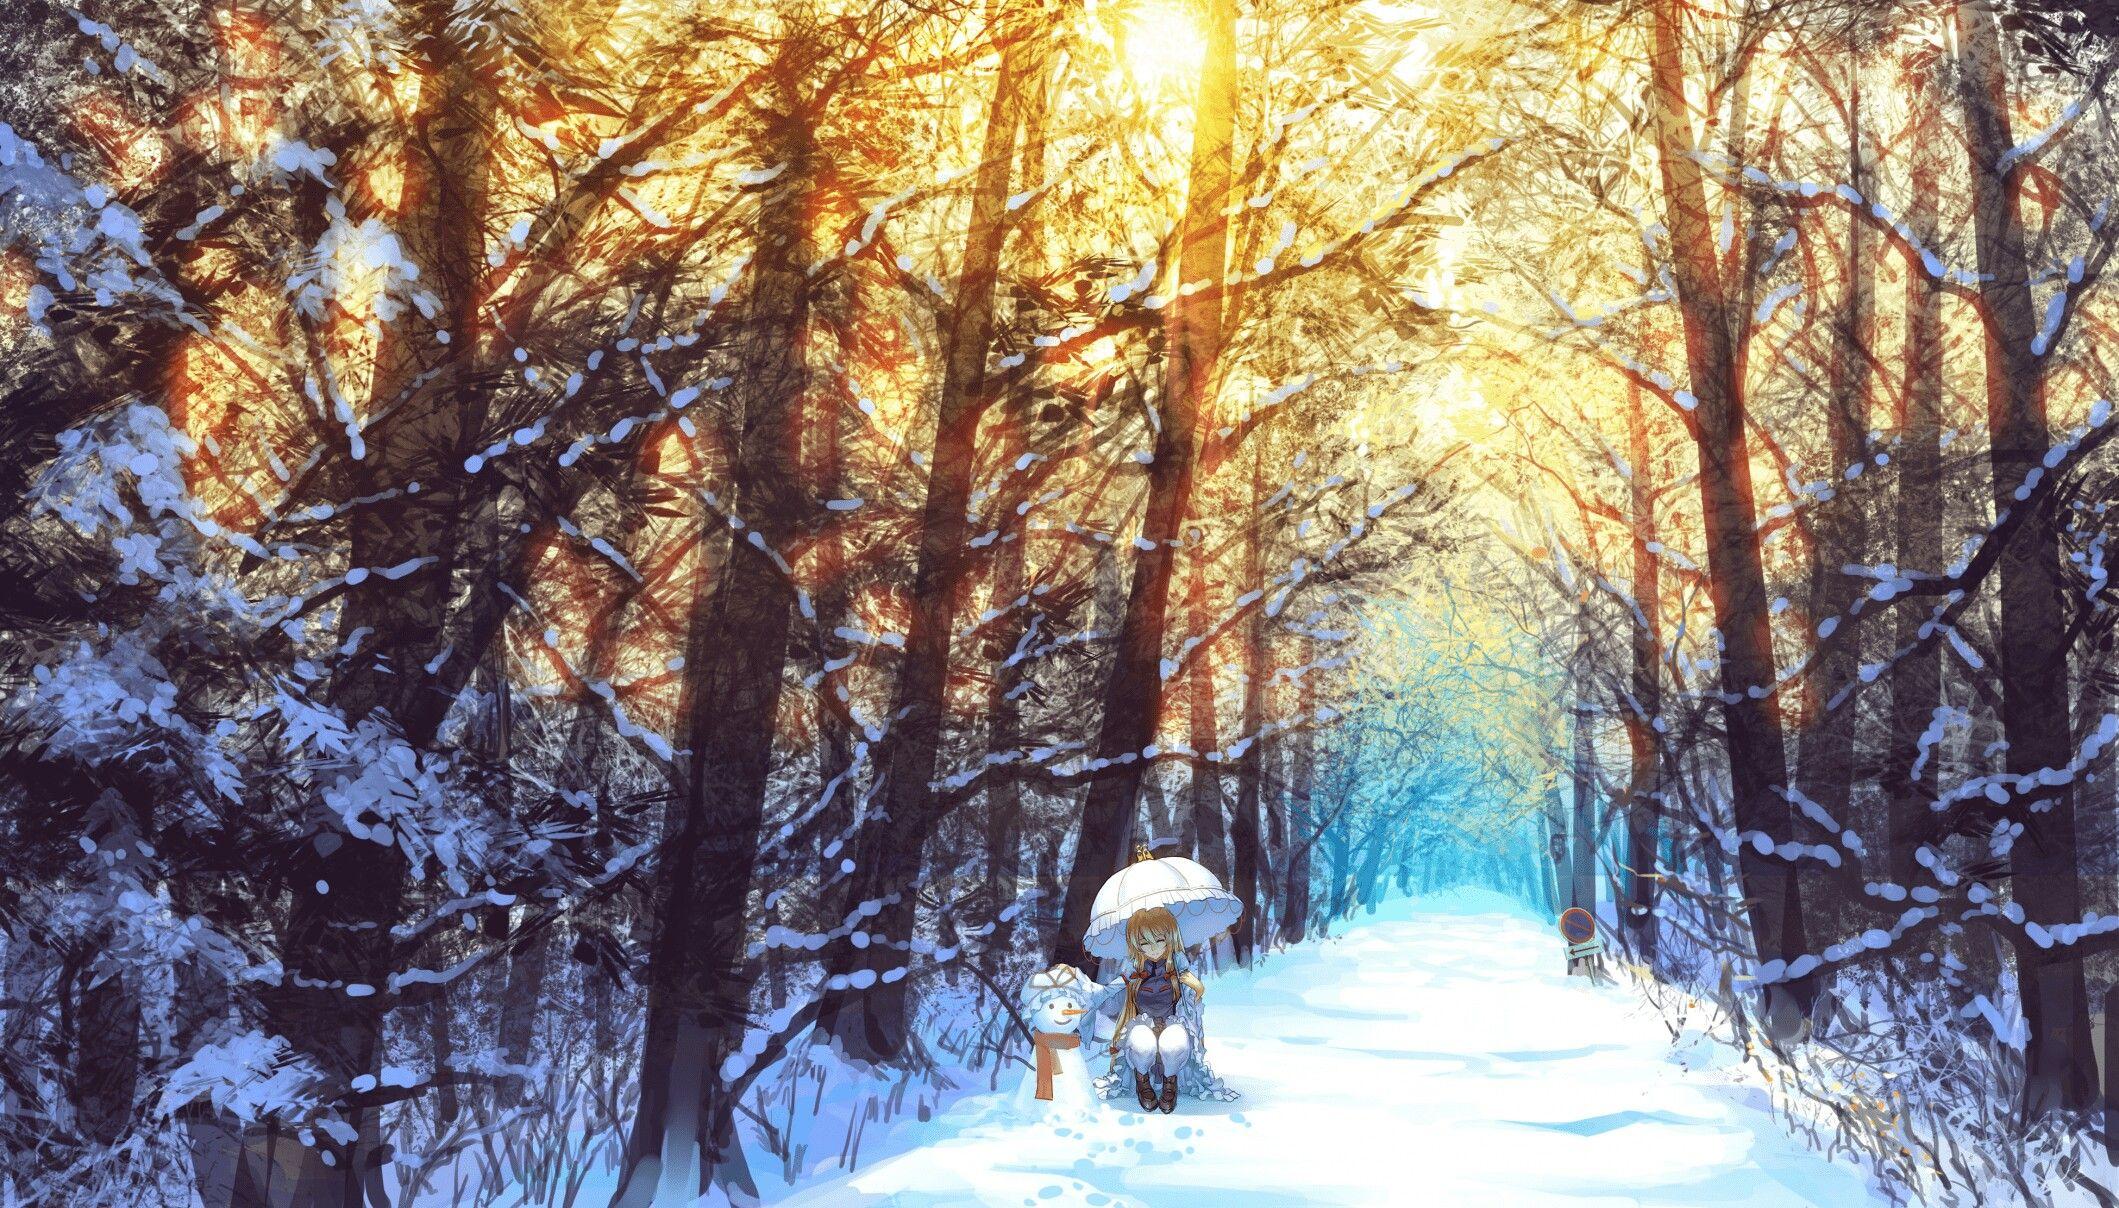 Snowy Forest in 2020 | Anime scenery, Scenery wallpaper ...